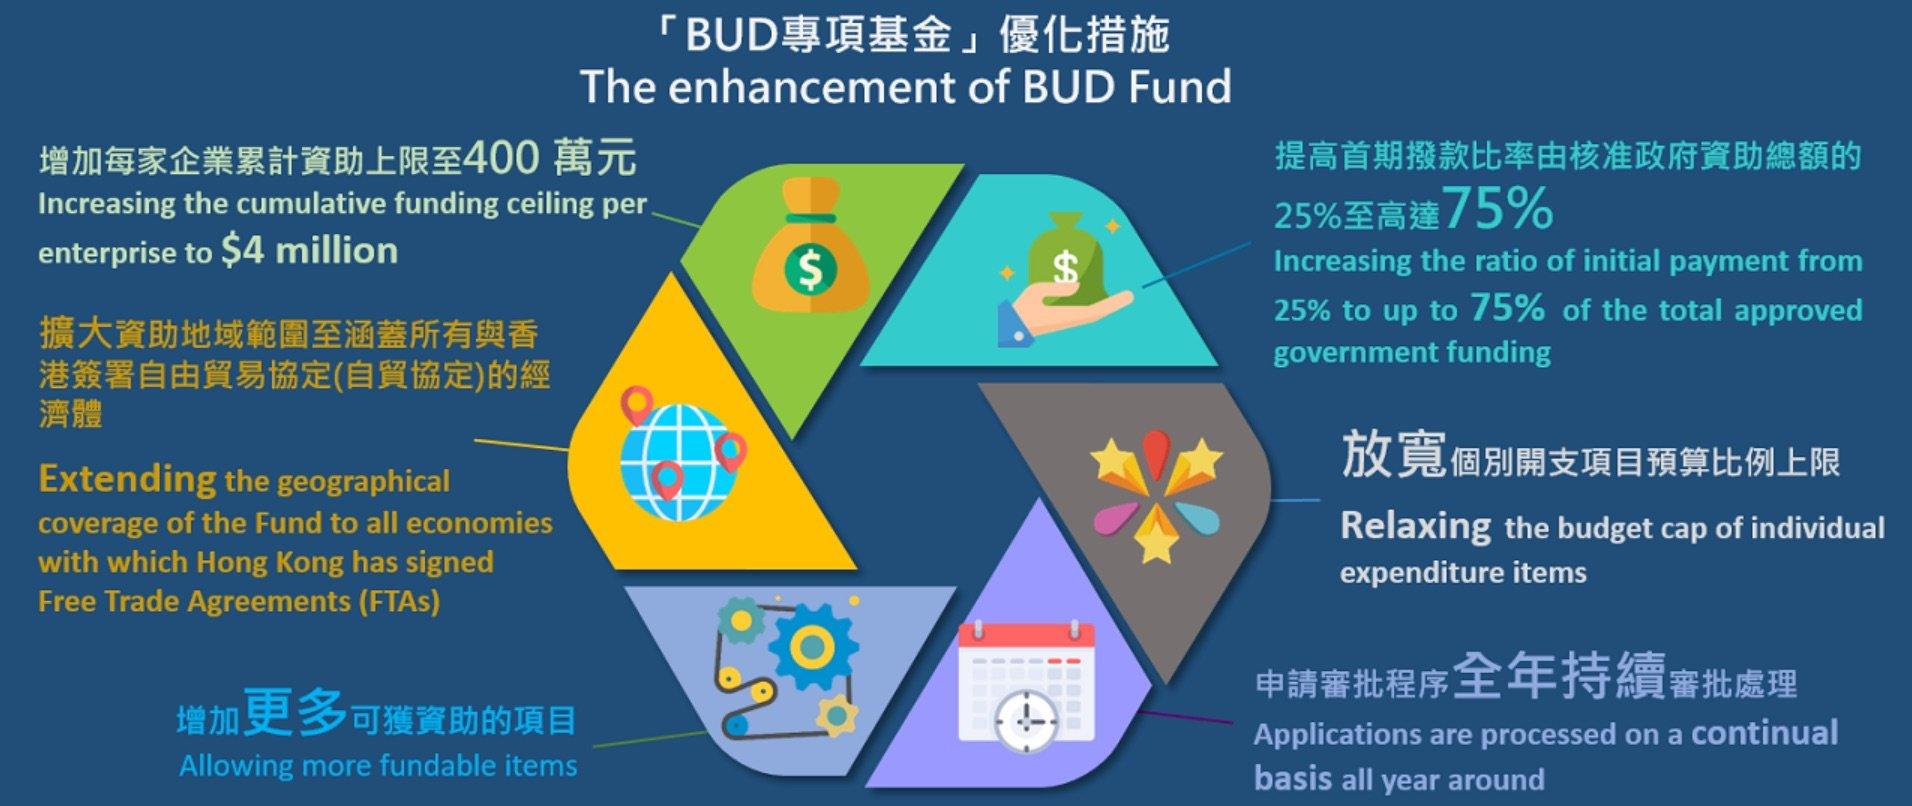 BUD_企業支援計劃___發展品牌、升級轉型及拓展內銷市場的專項基金